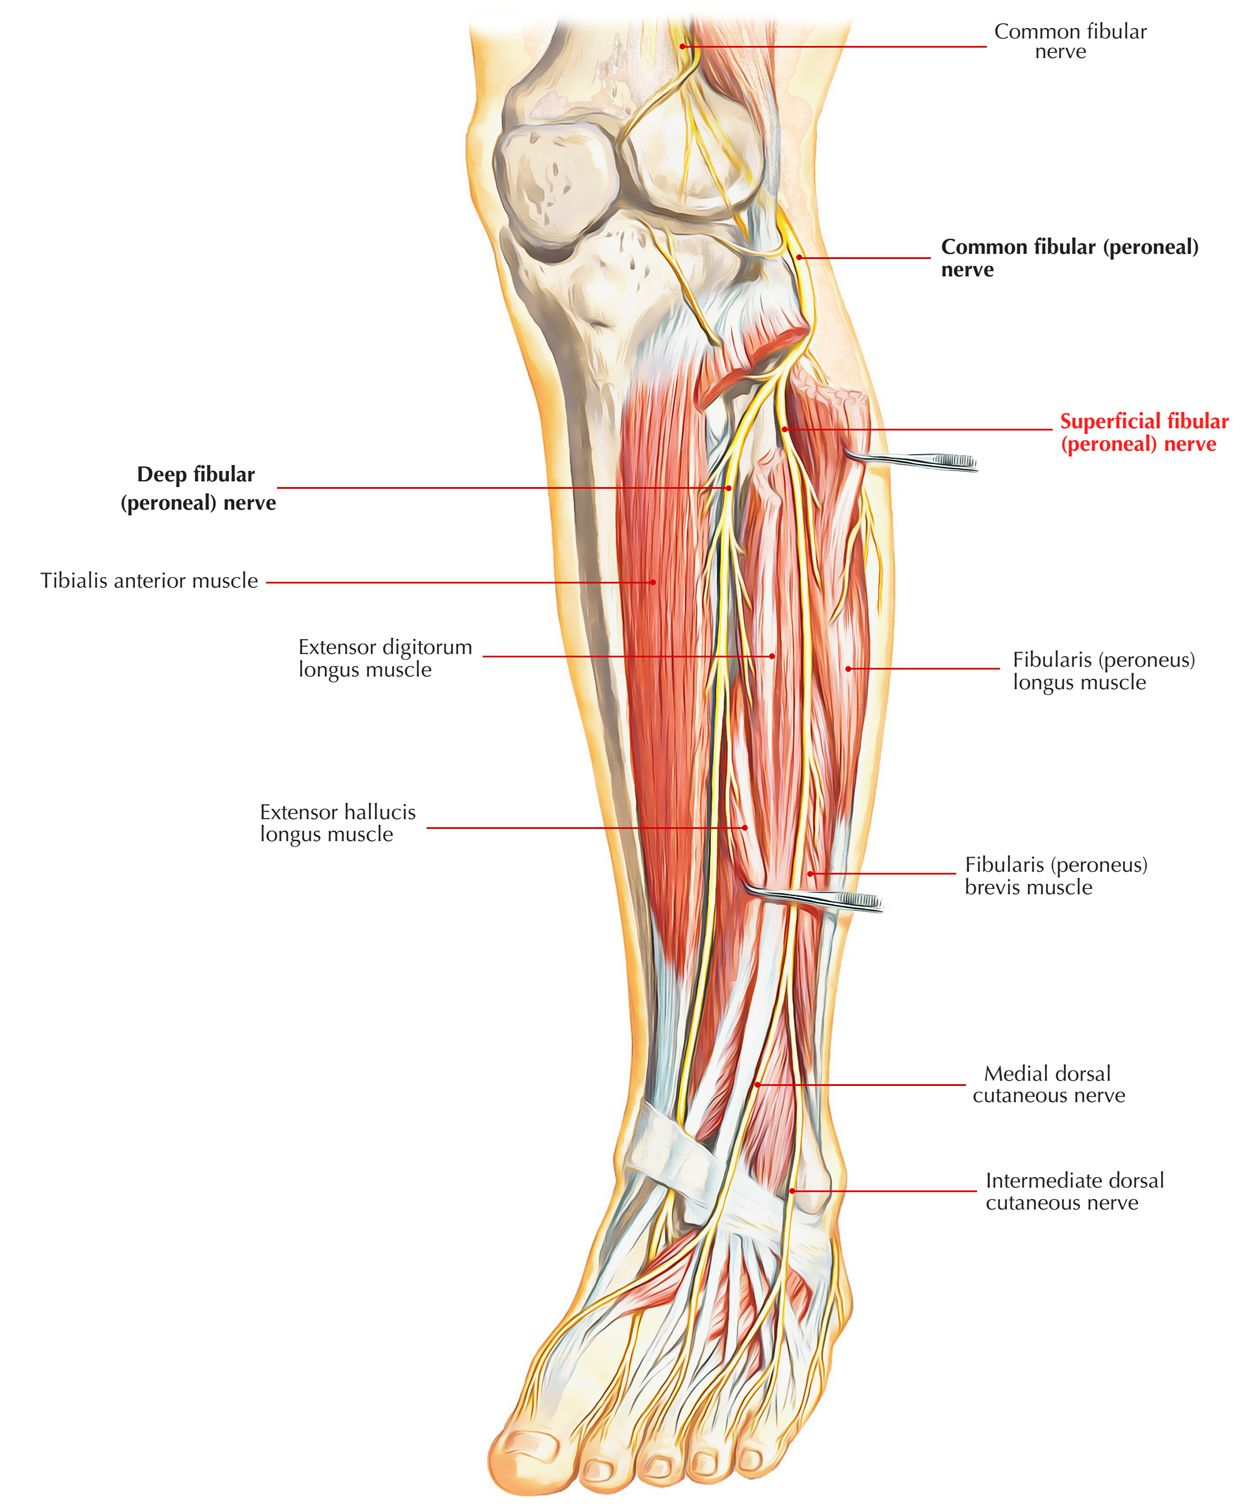 medium resolution of foot nerve diagram wiring diagram inside foot diagram nerve endings foot nerve diagram